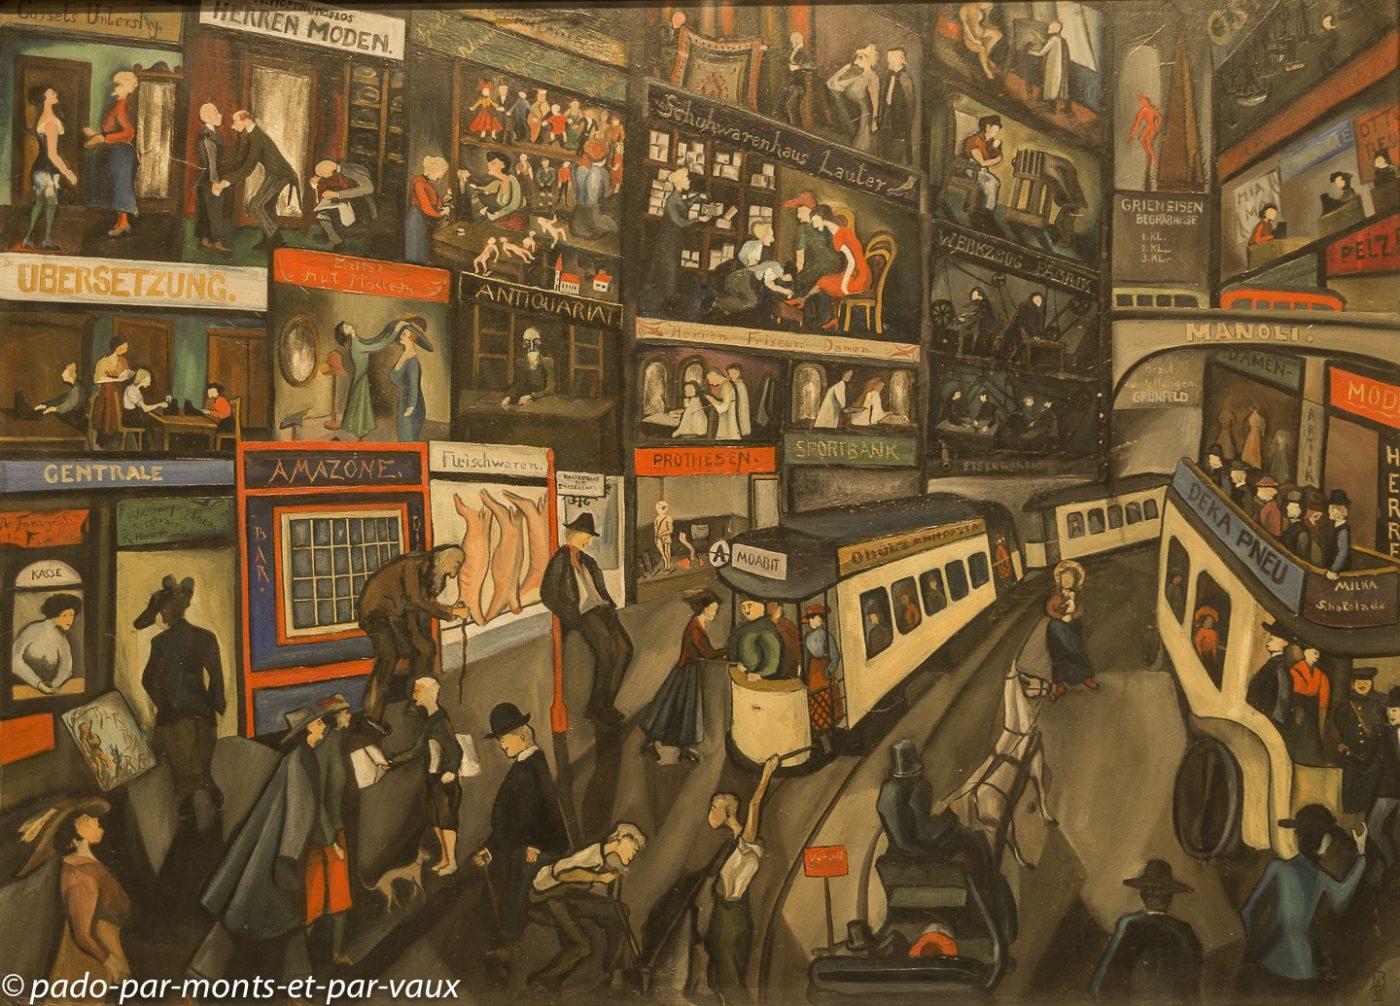 Berlin - Berlinische Galerie - Nikolaus Braun